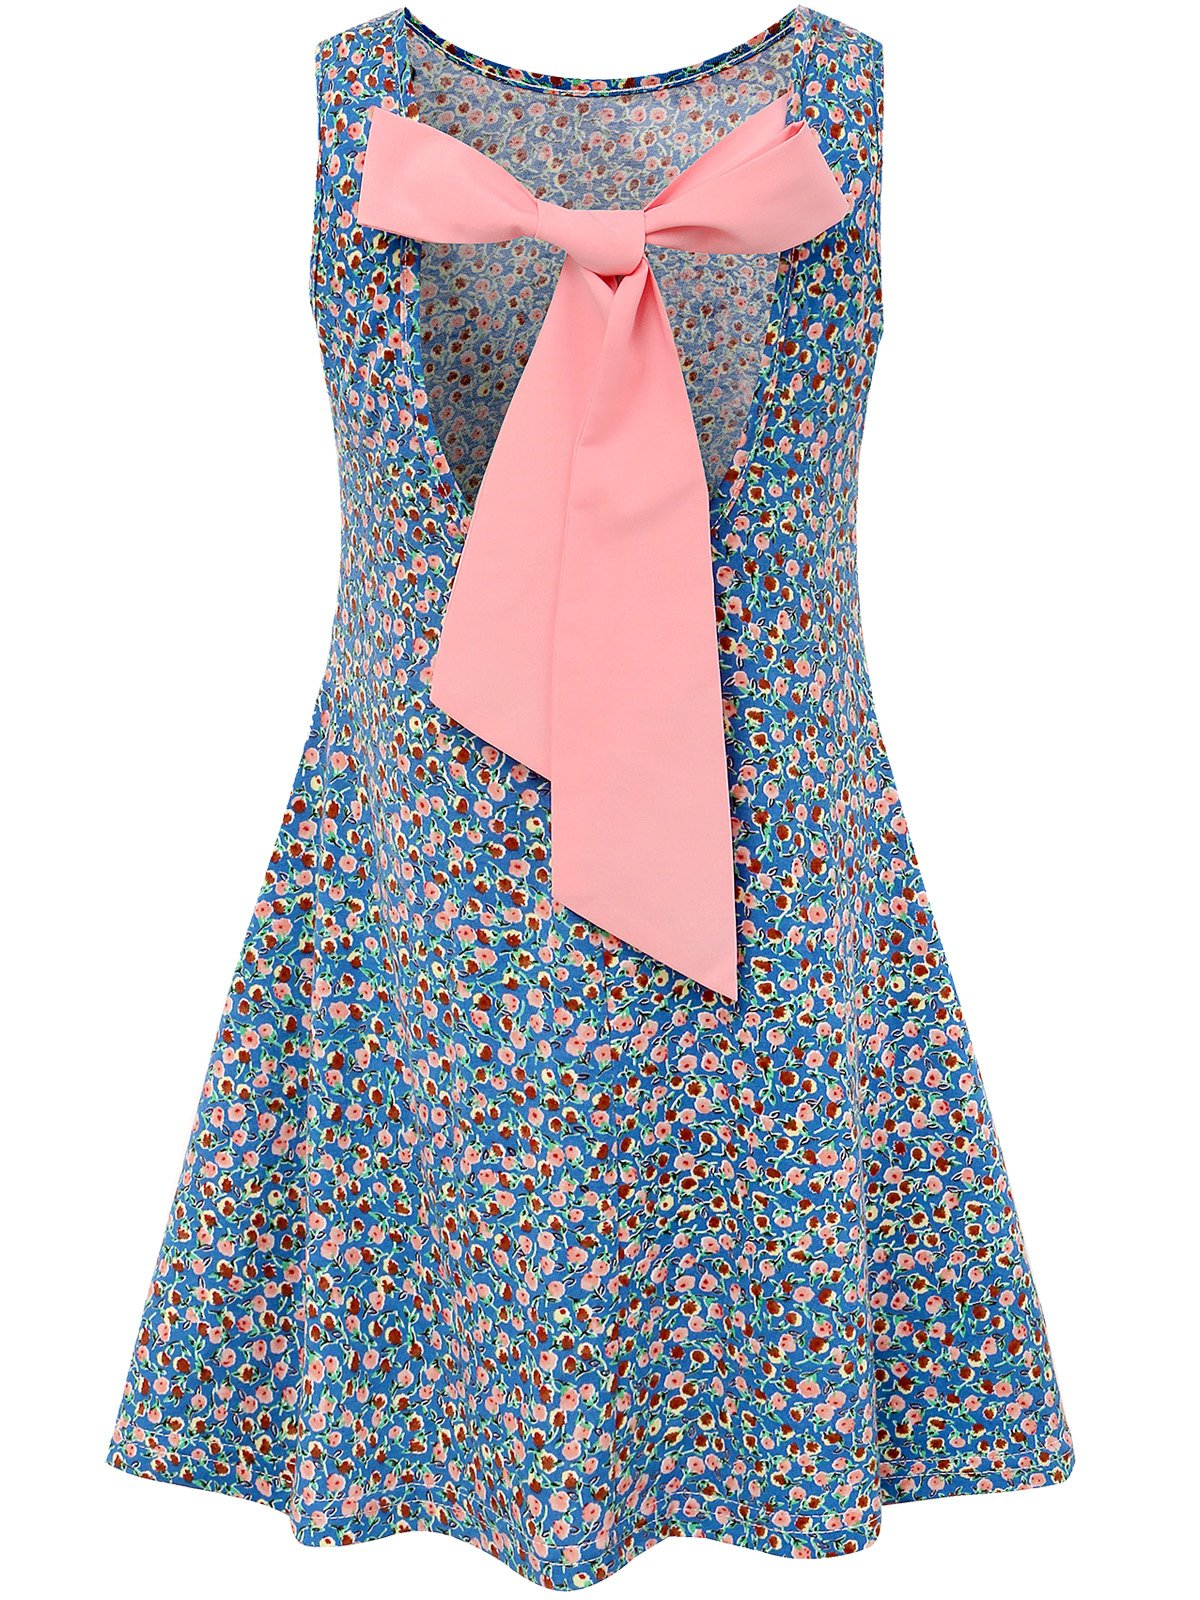 Bonny Billy Girls Backless Bow Cotton Summer Floral Dress Size 10 Blue